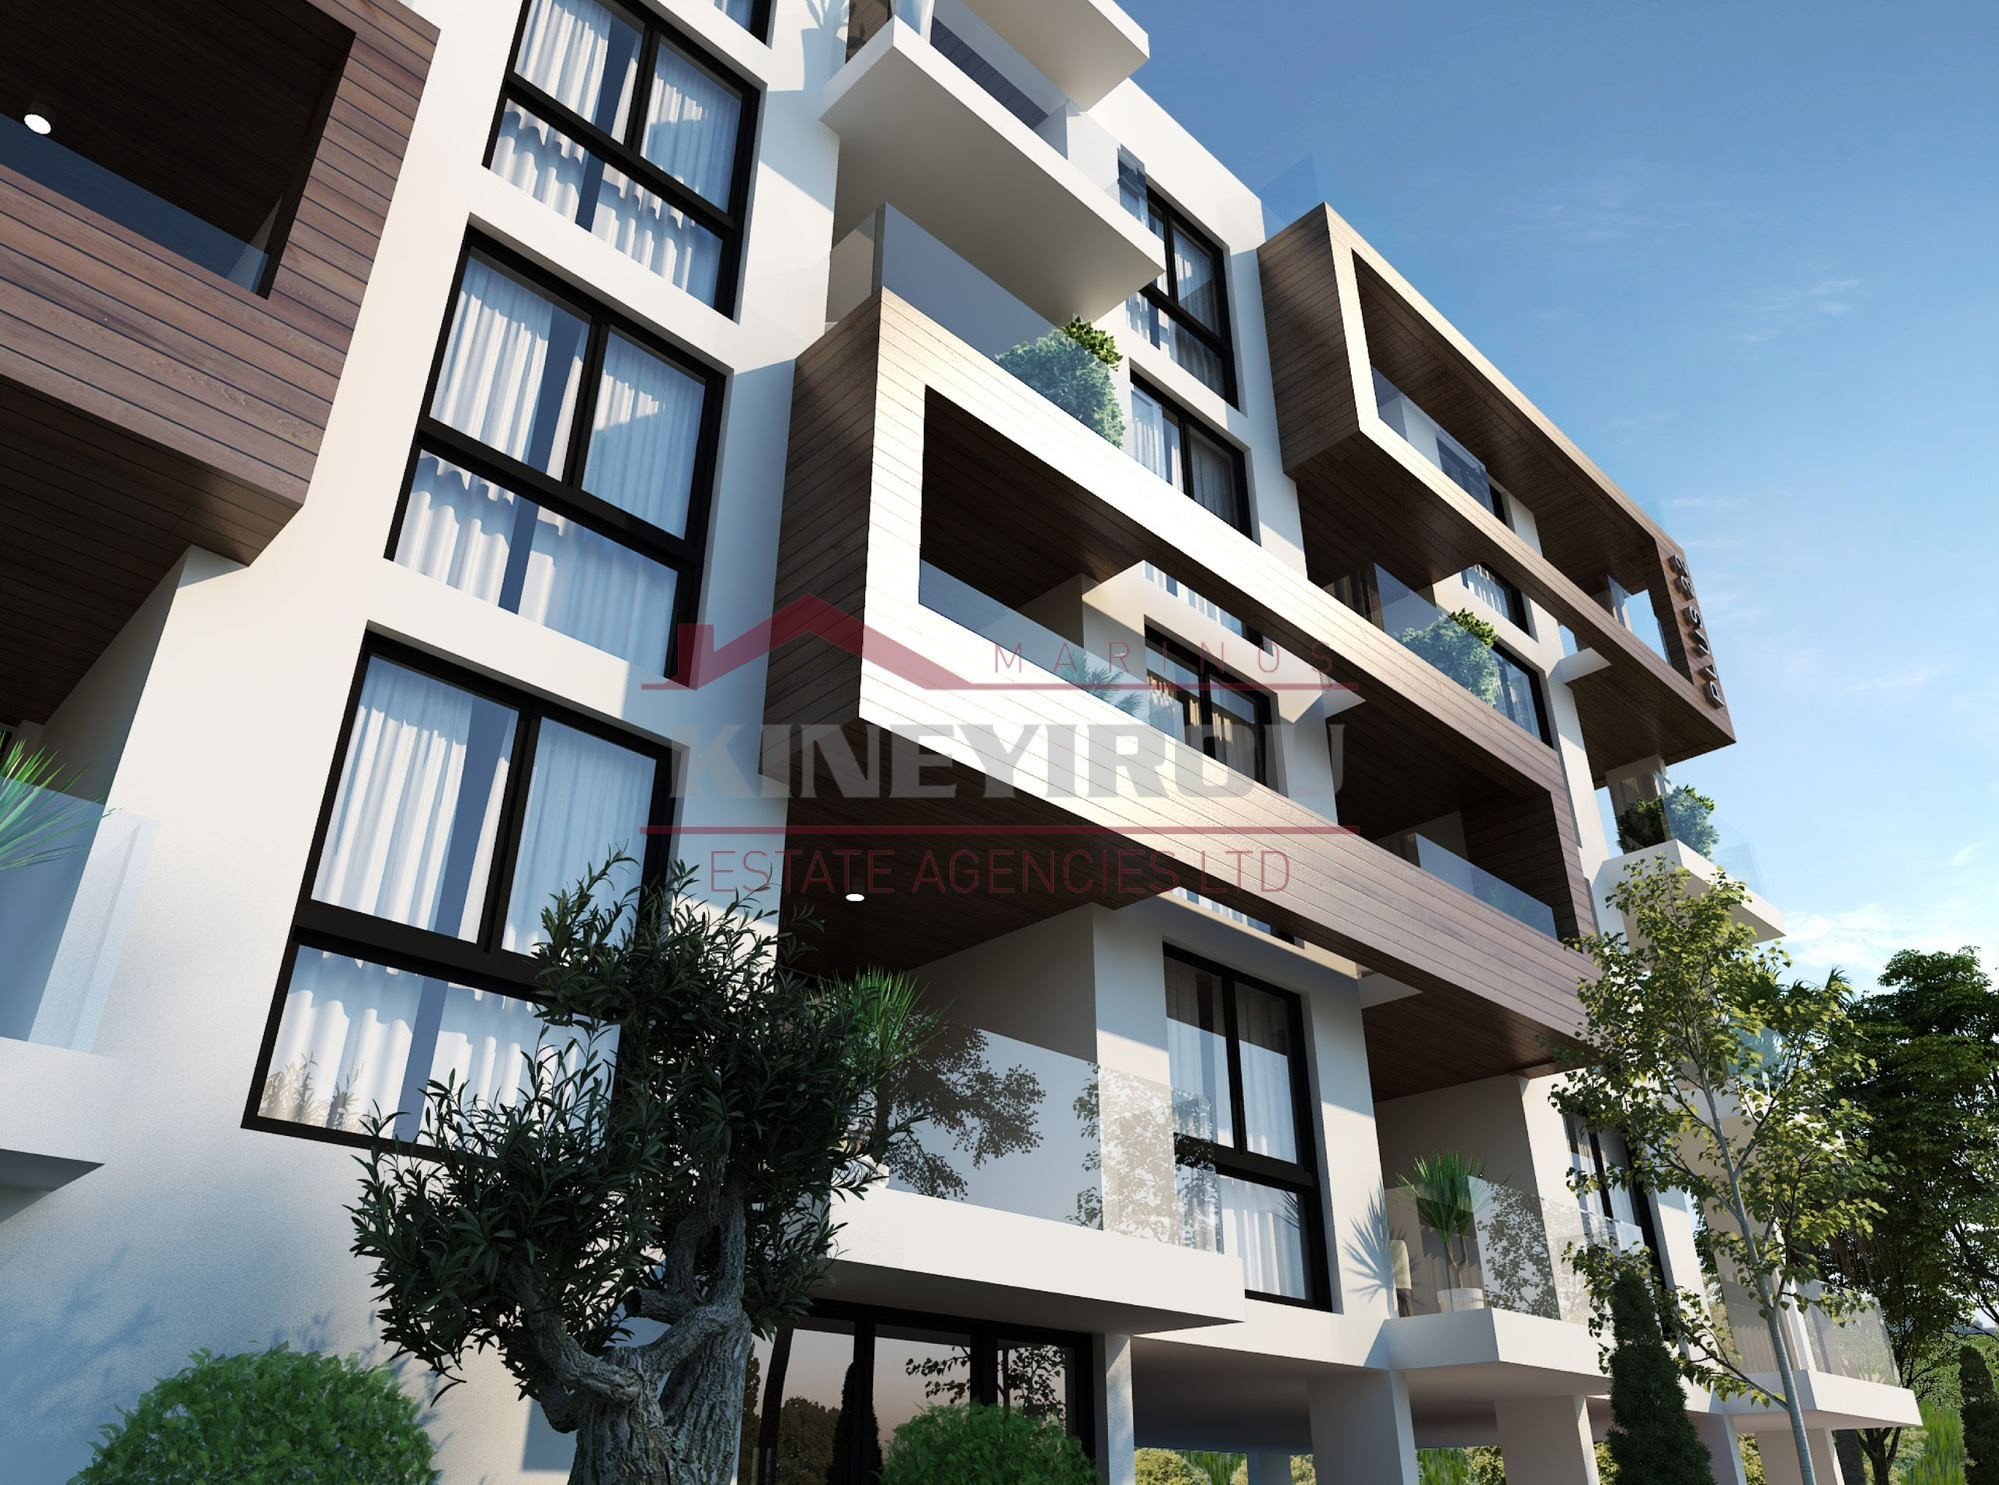 2 Bedroom apartment in Larnaca Town Center